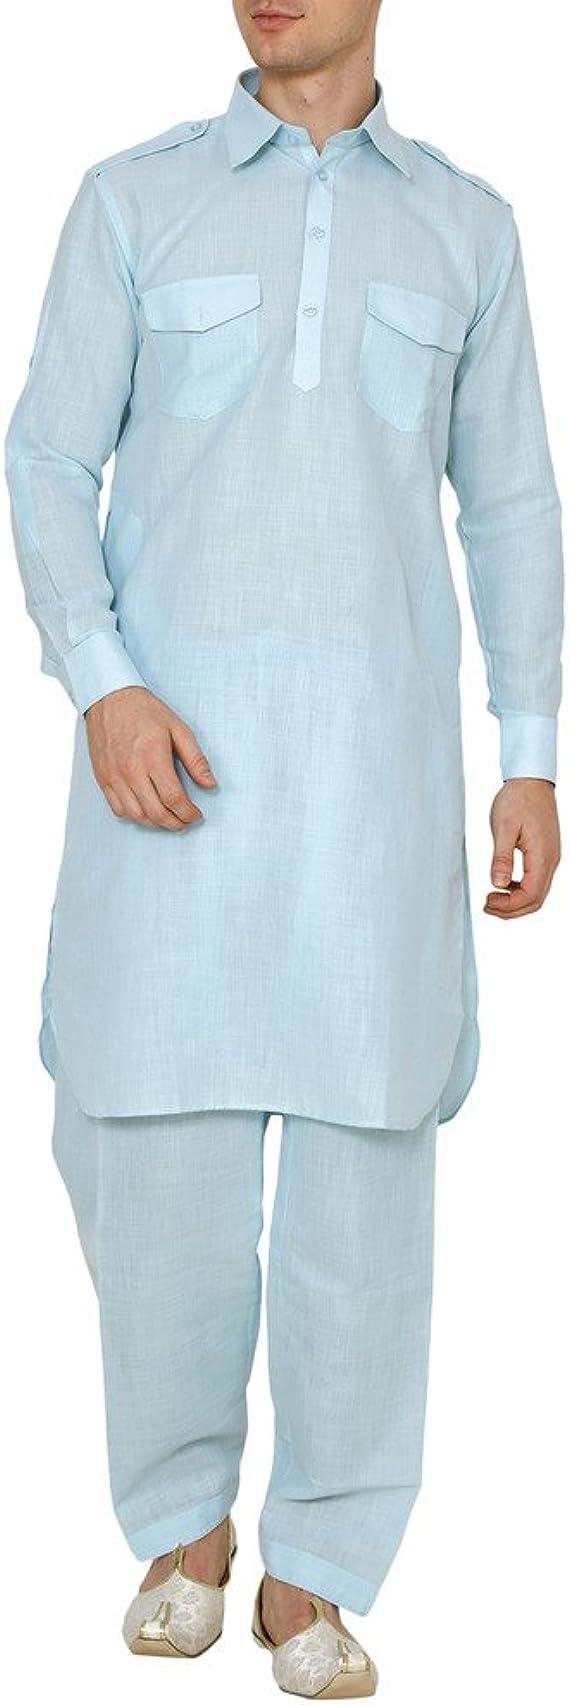 YATHABI Mens Cotton Pathani Suit Traditional Salwar Kameez Eid Kurta Pajama Set